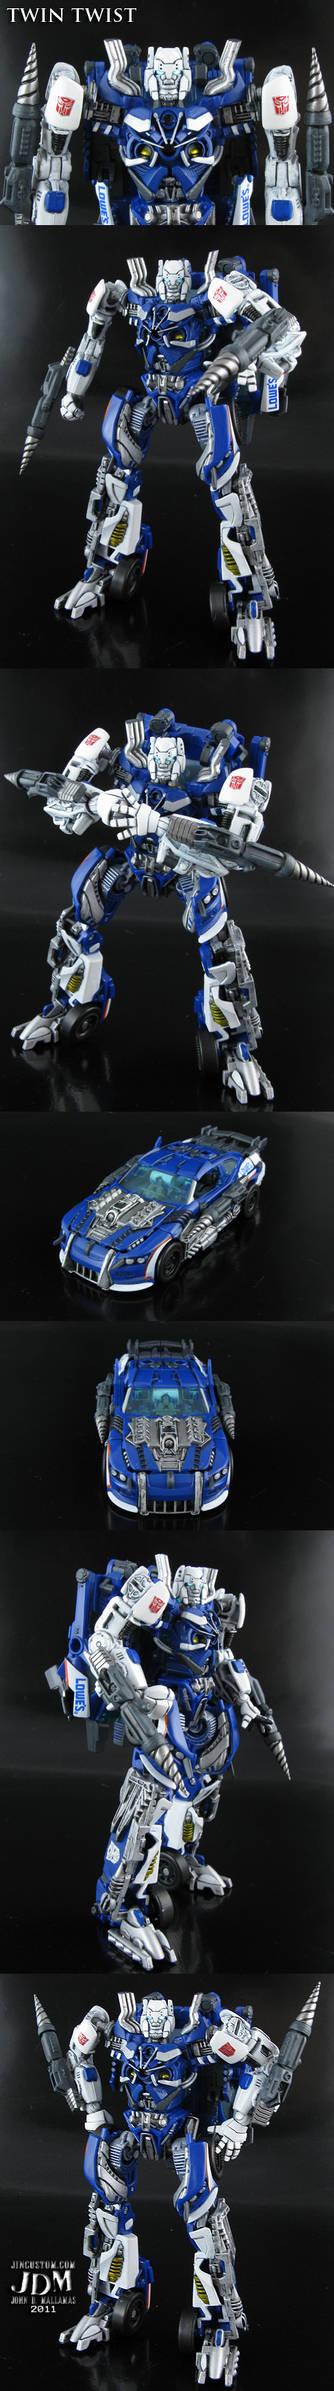 Transformers Twin Twist